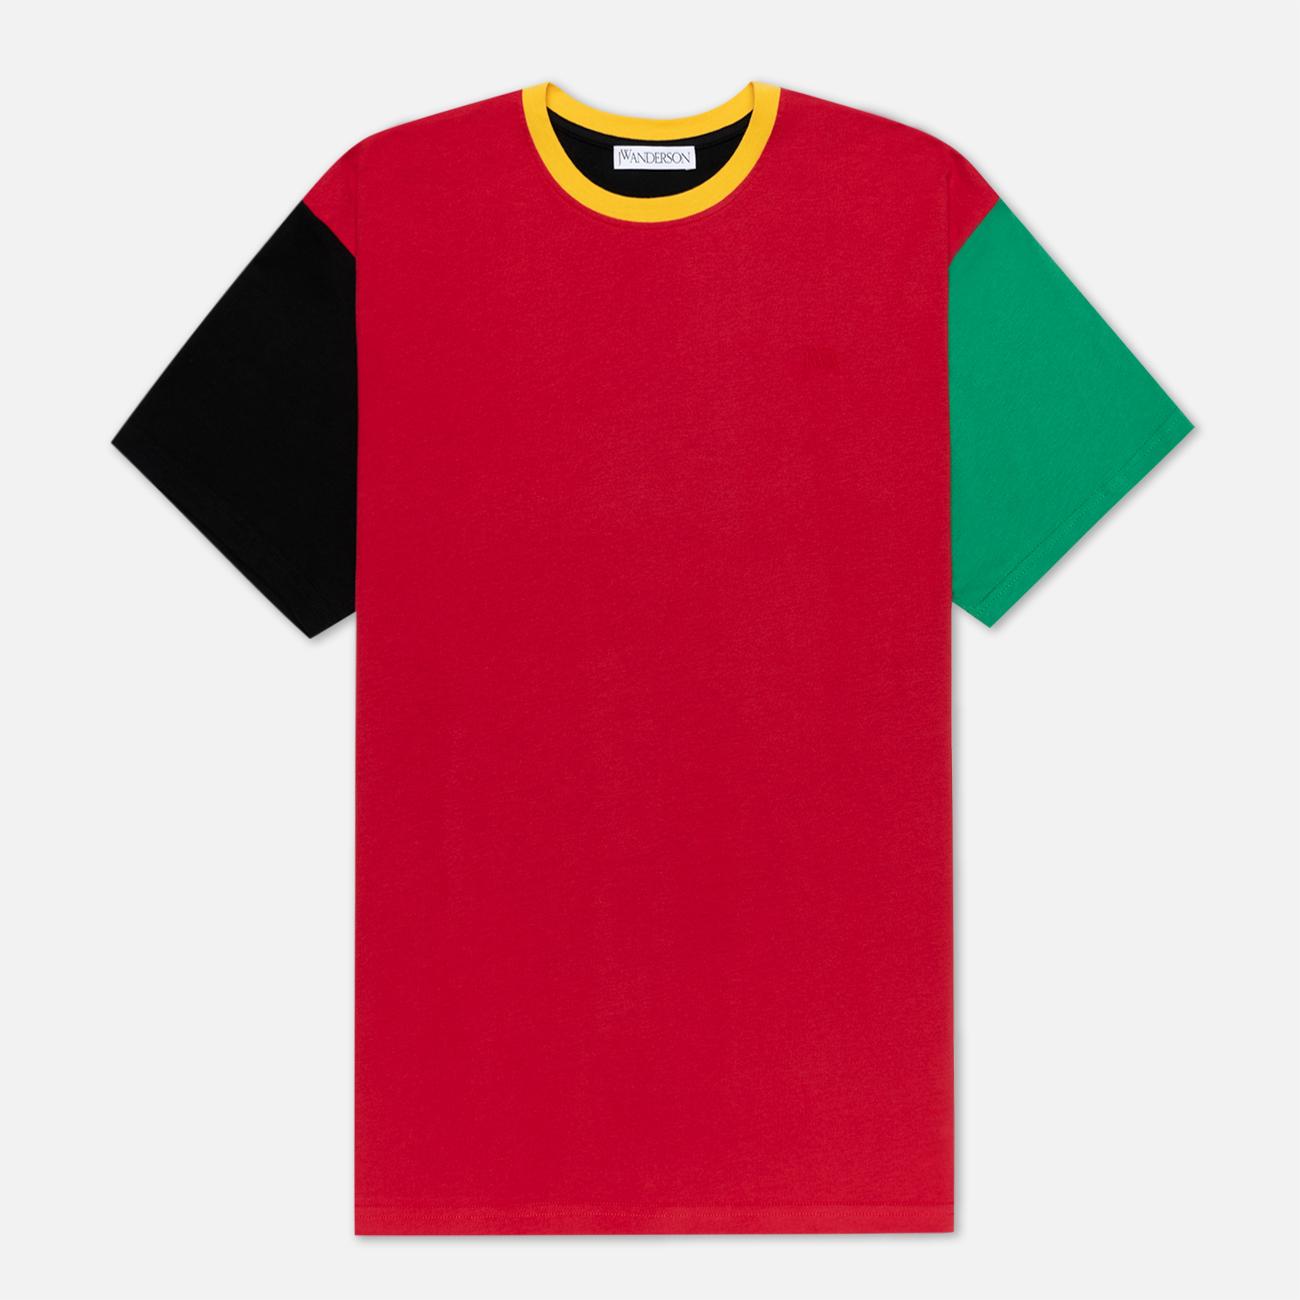 Мужская футболка JW Anderson Colourblock Red/Black